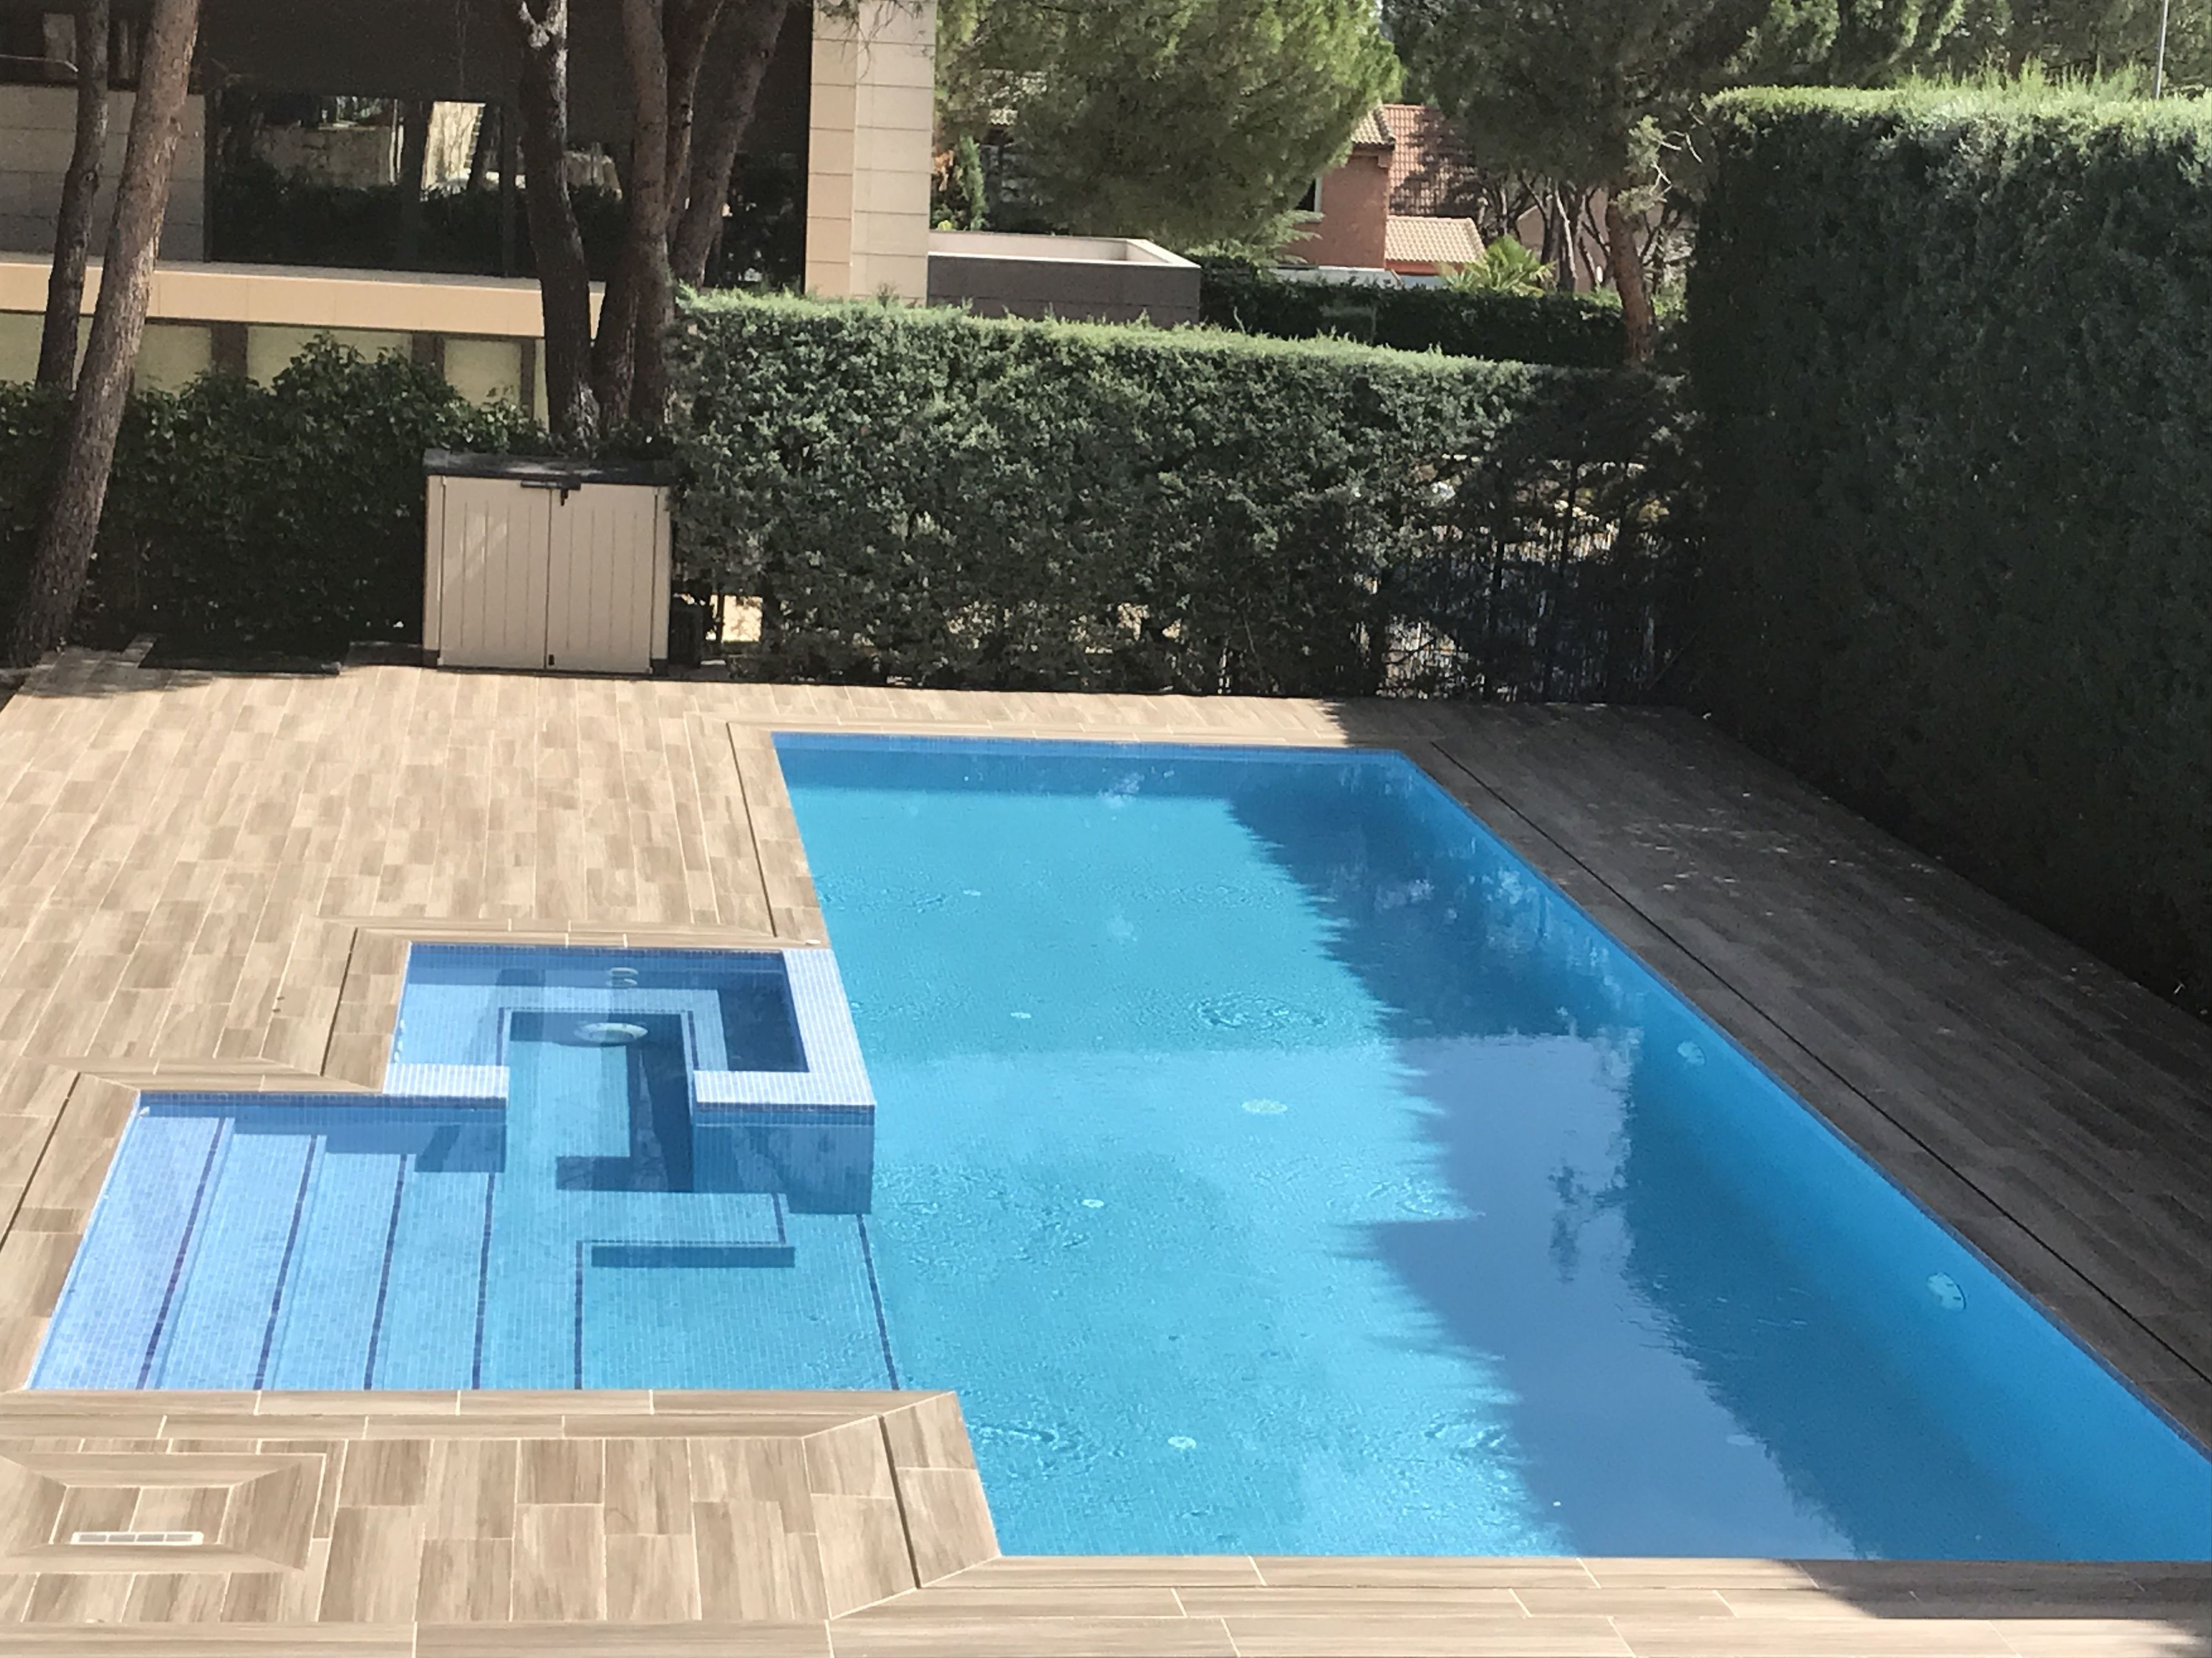 piscina desbordante en San sebastian de los reyes